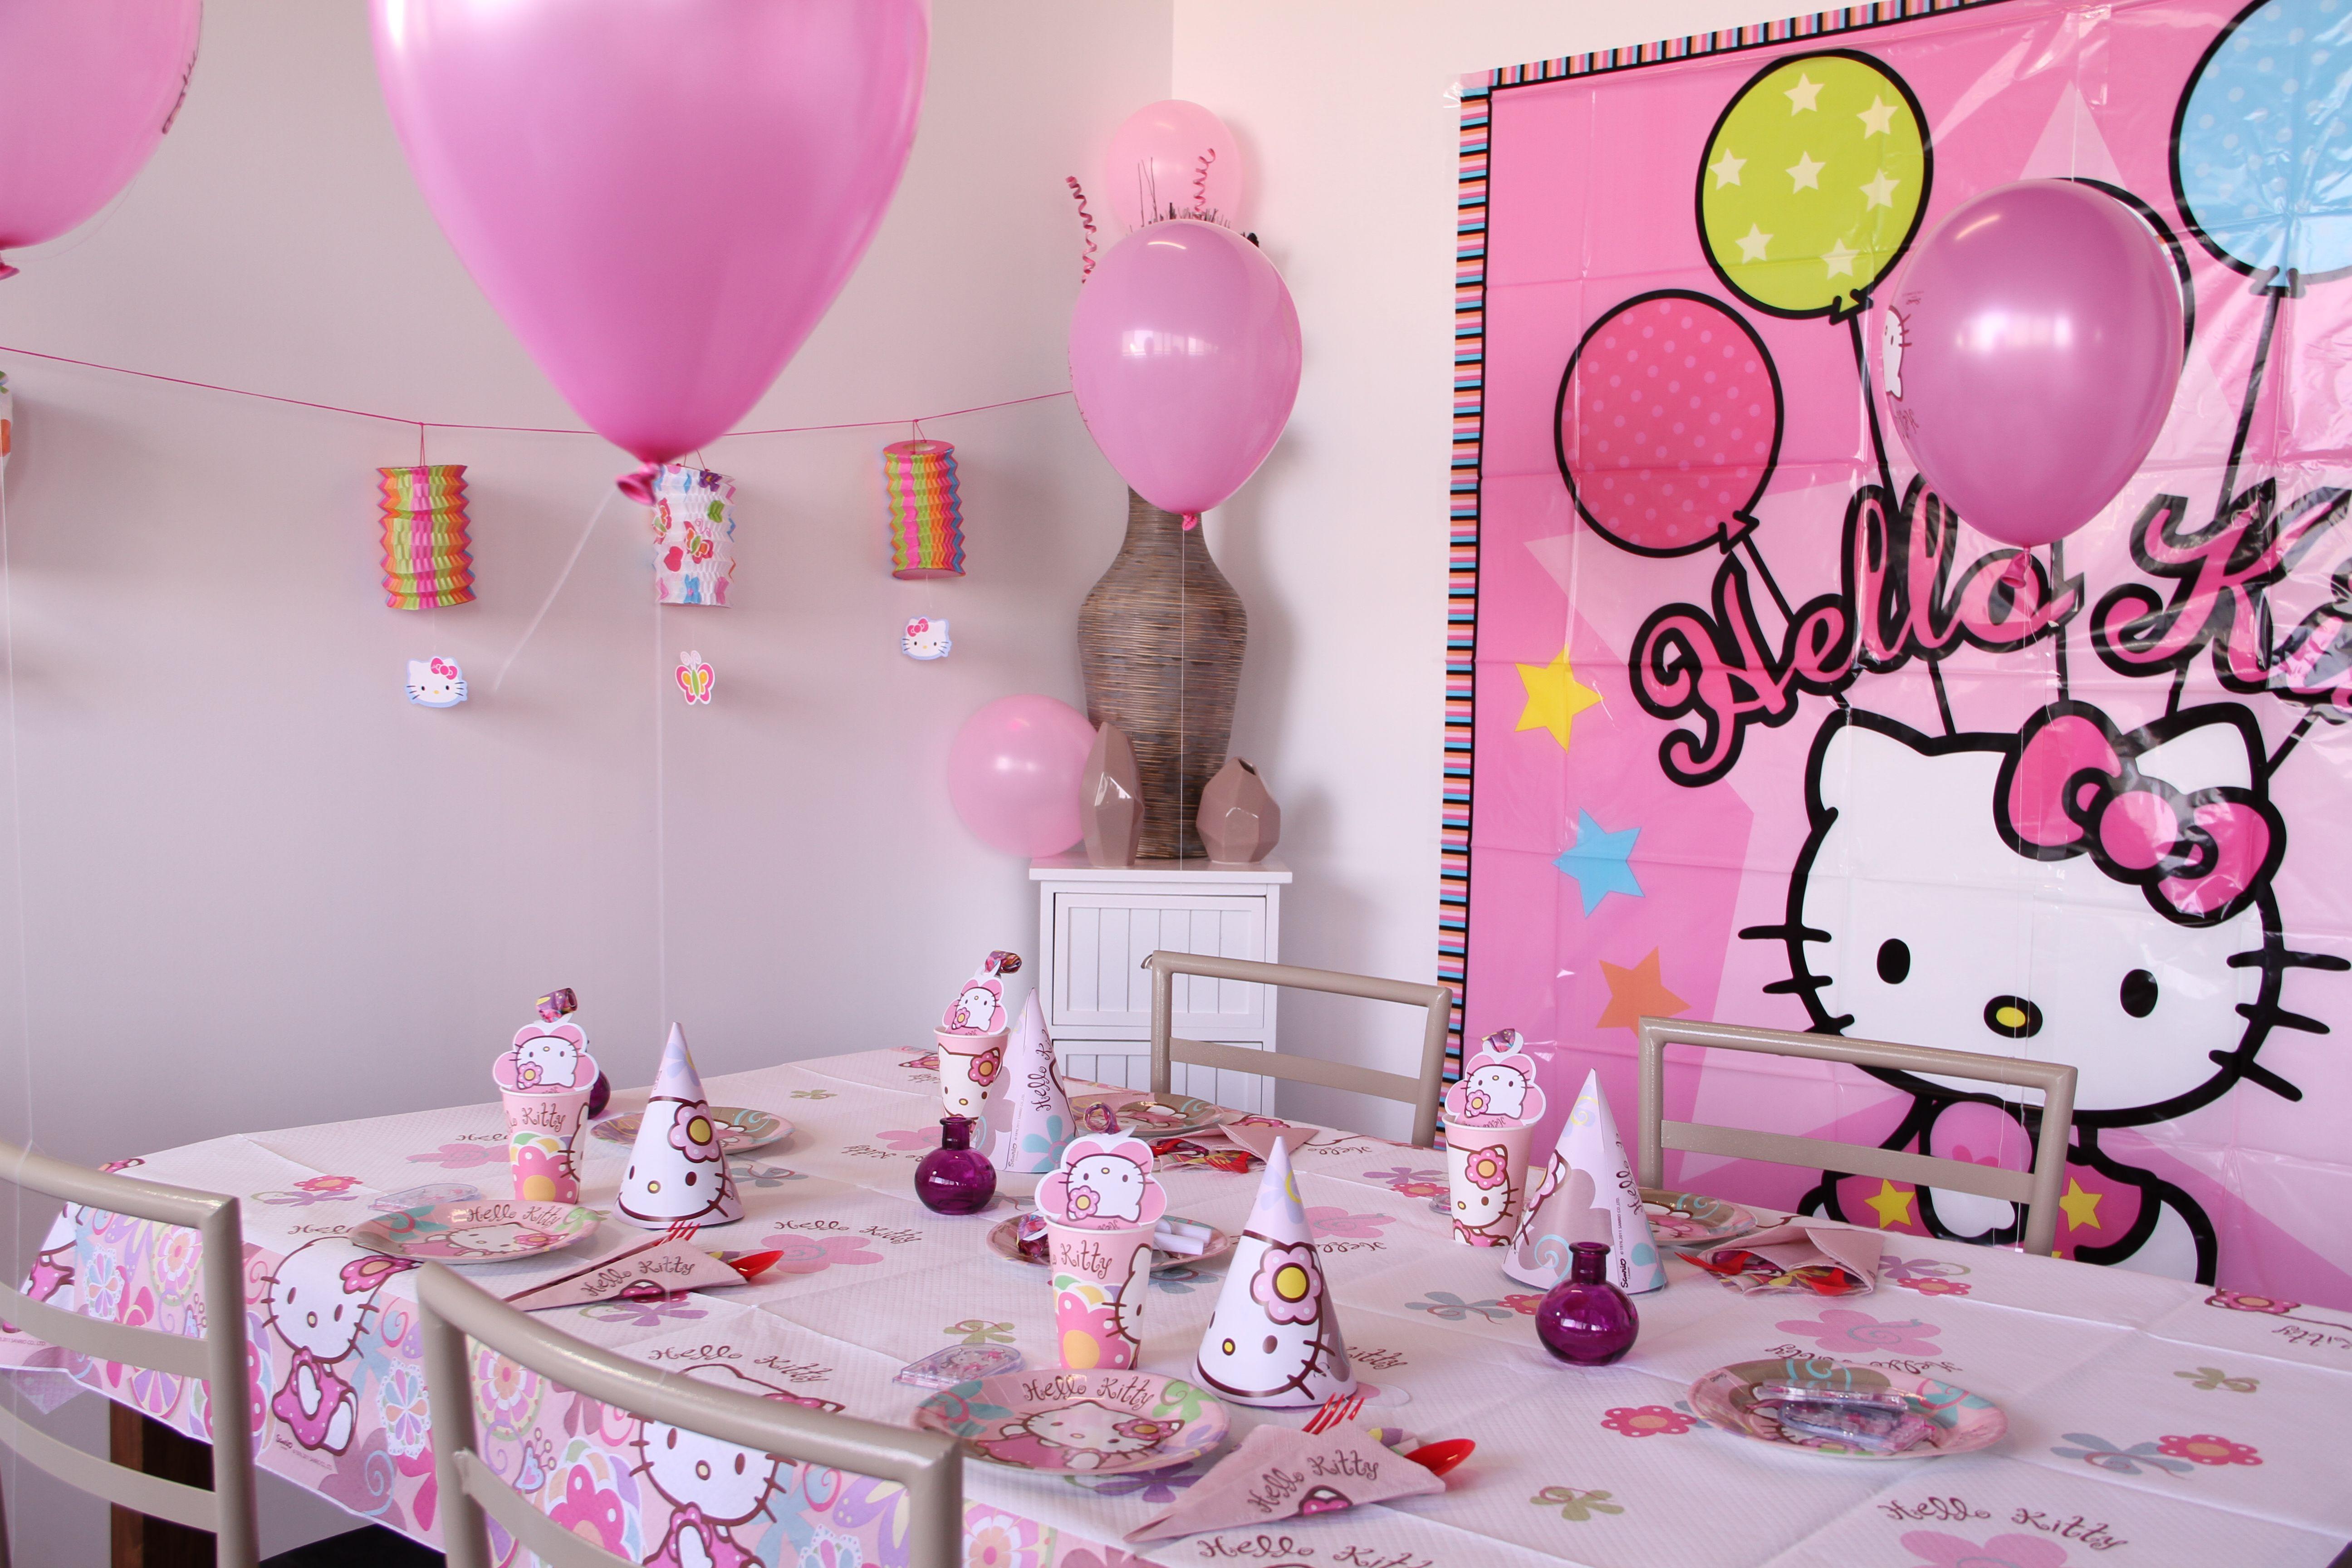 deco hello kitty anniversaire